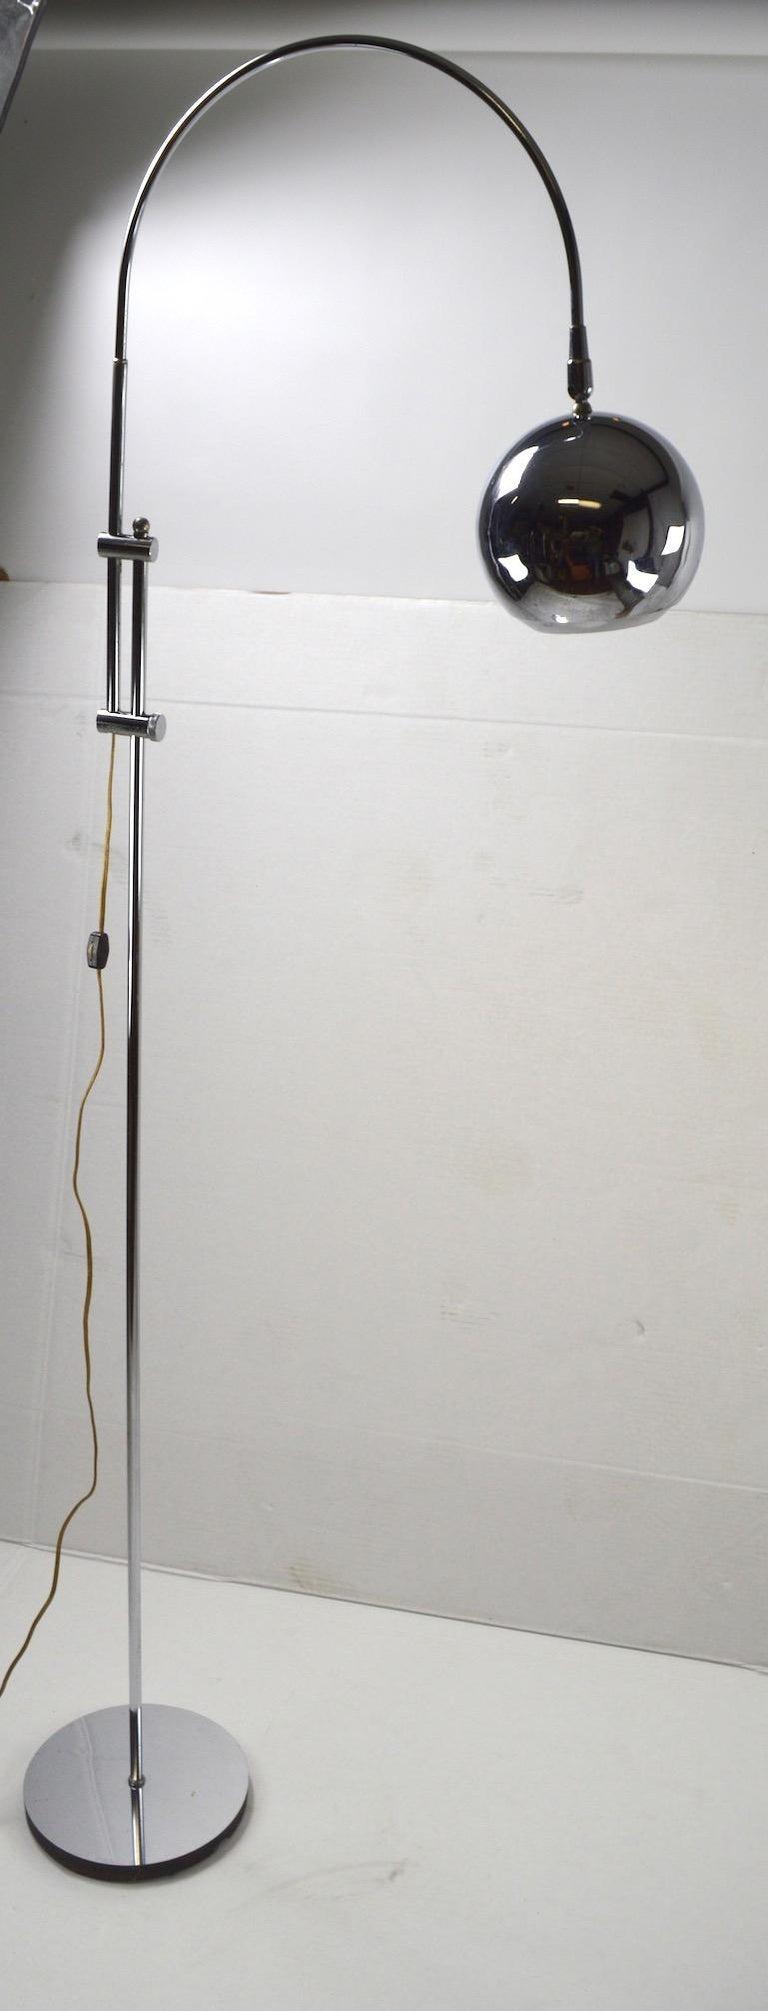 Mid-Century Modern Adjustable Chrome Arc Lamp with Eyeball Shade For Sale